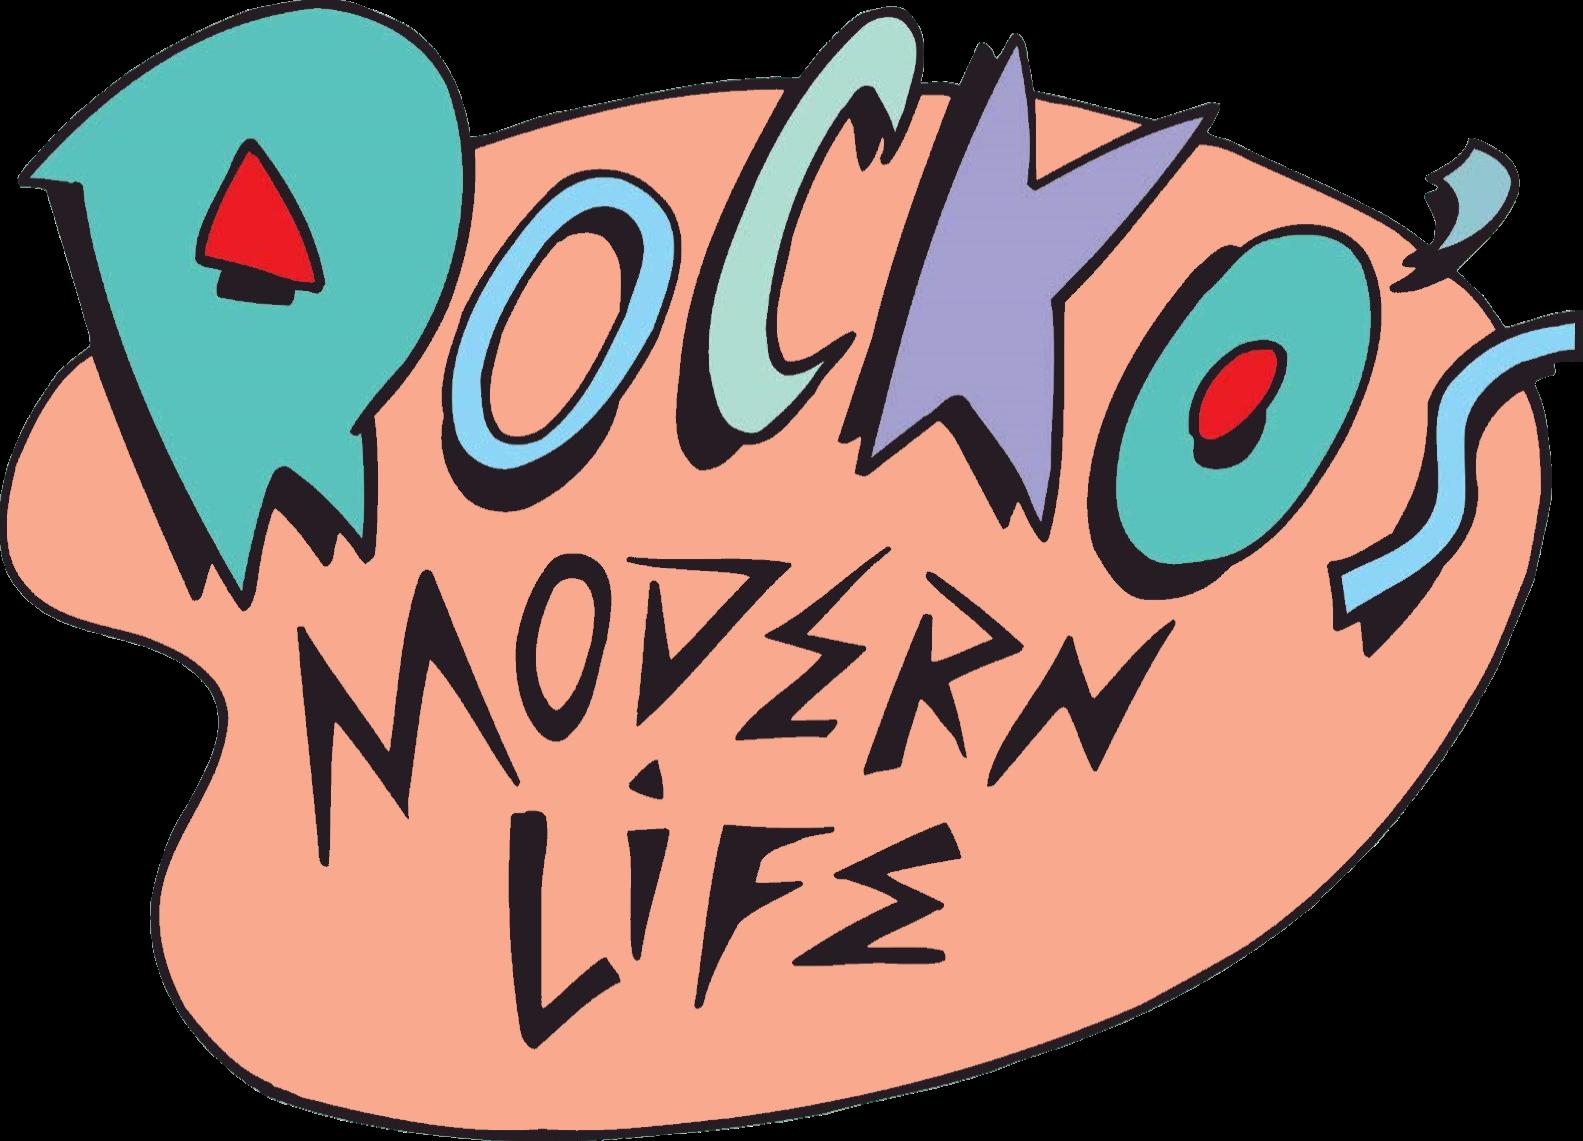 File:Rocko's Modern Life logo.png